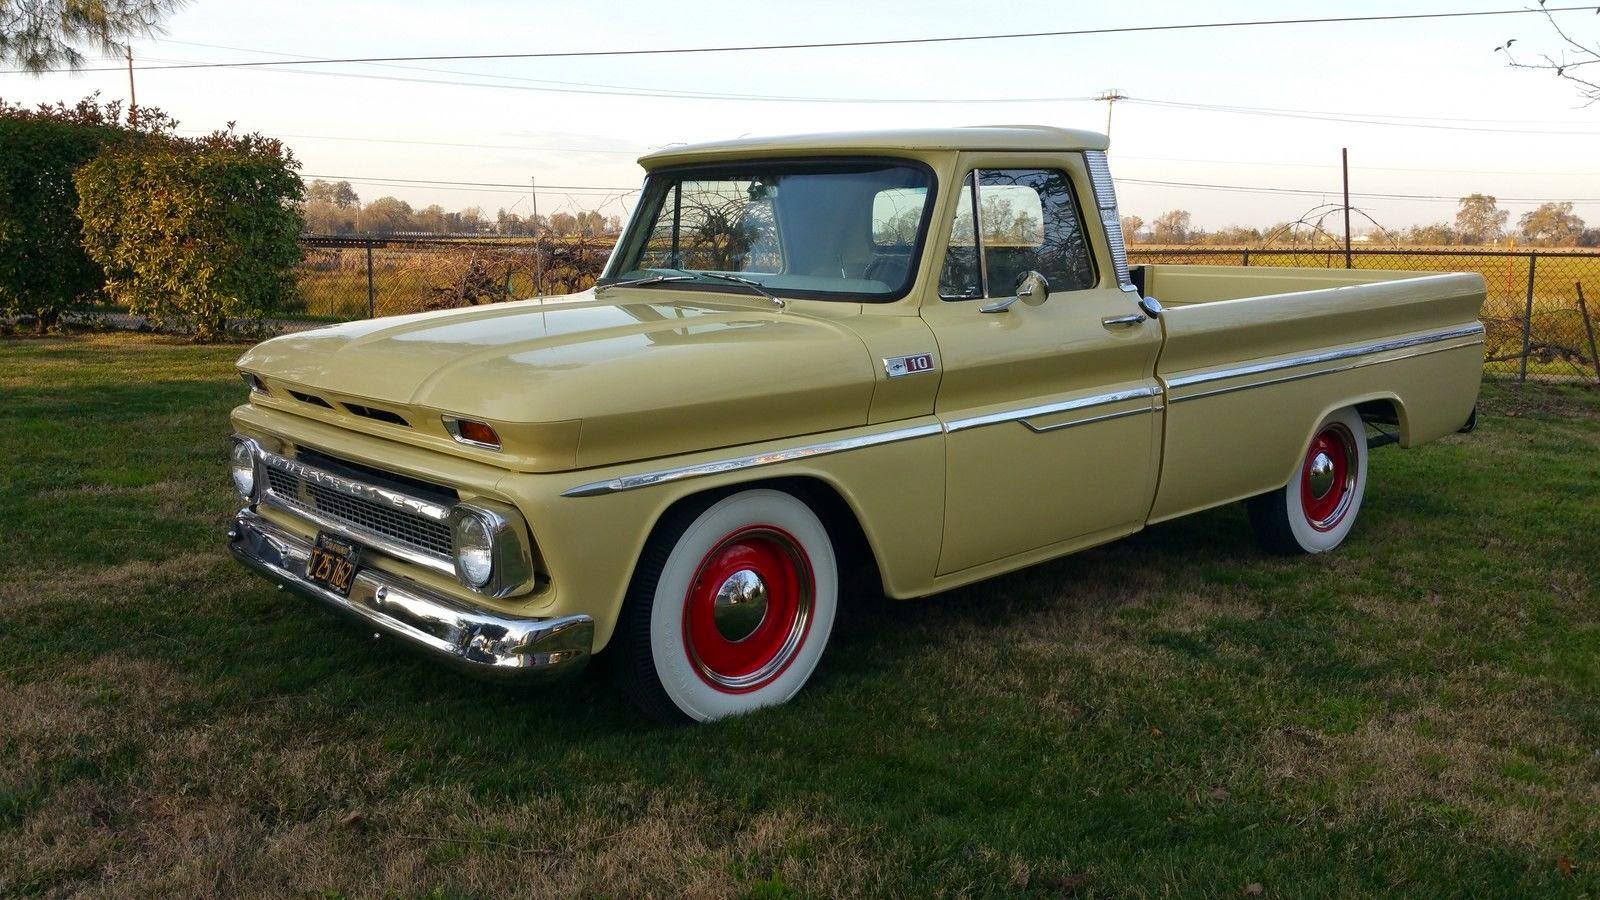 All American Classic Cars: 1965 Chevrolet C-10 Pickup Truck